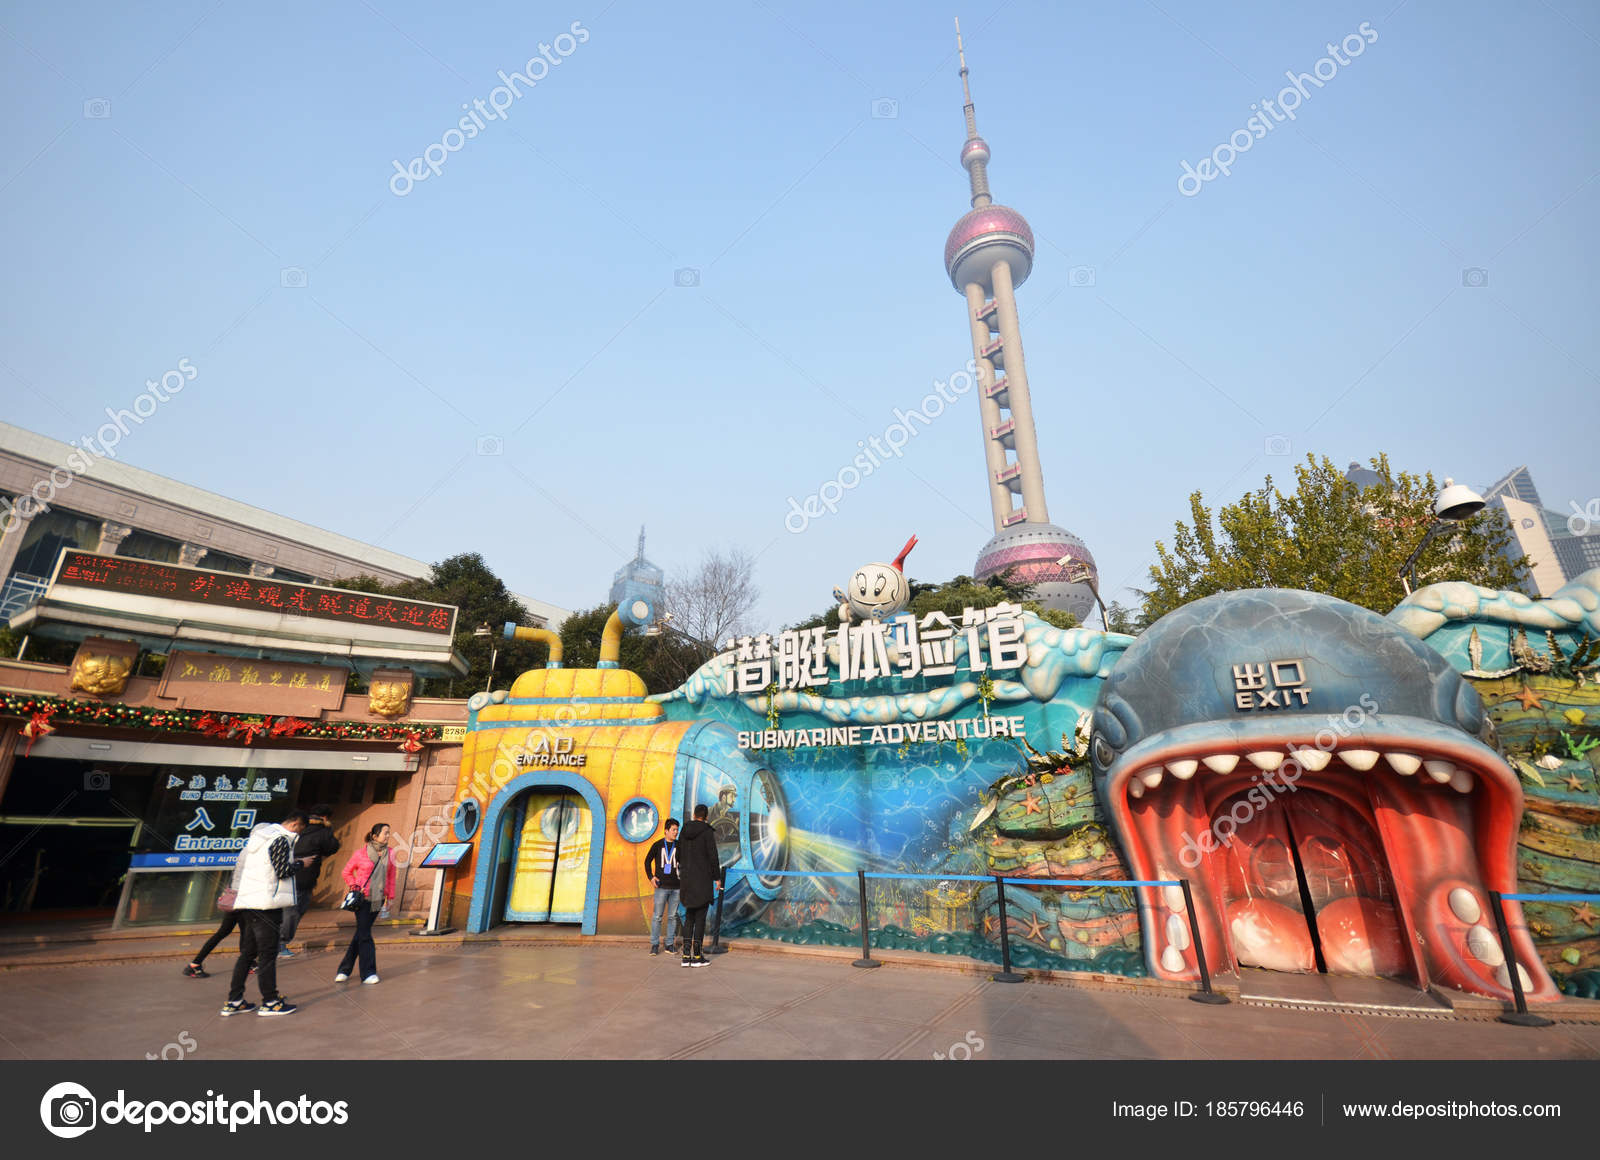 Entrance of Submarine Adventure park in Shanghai – Stock